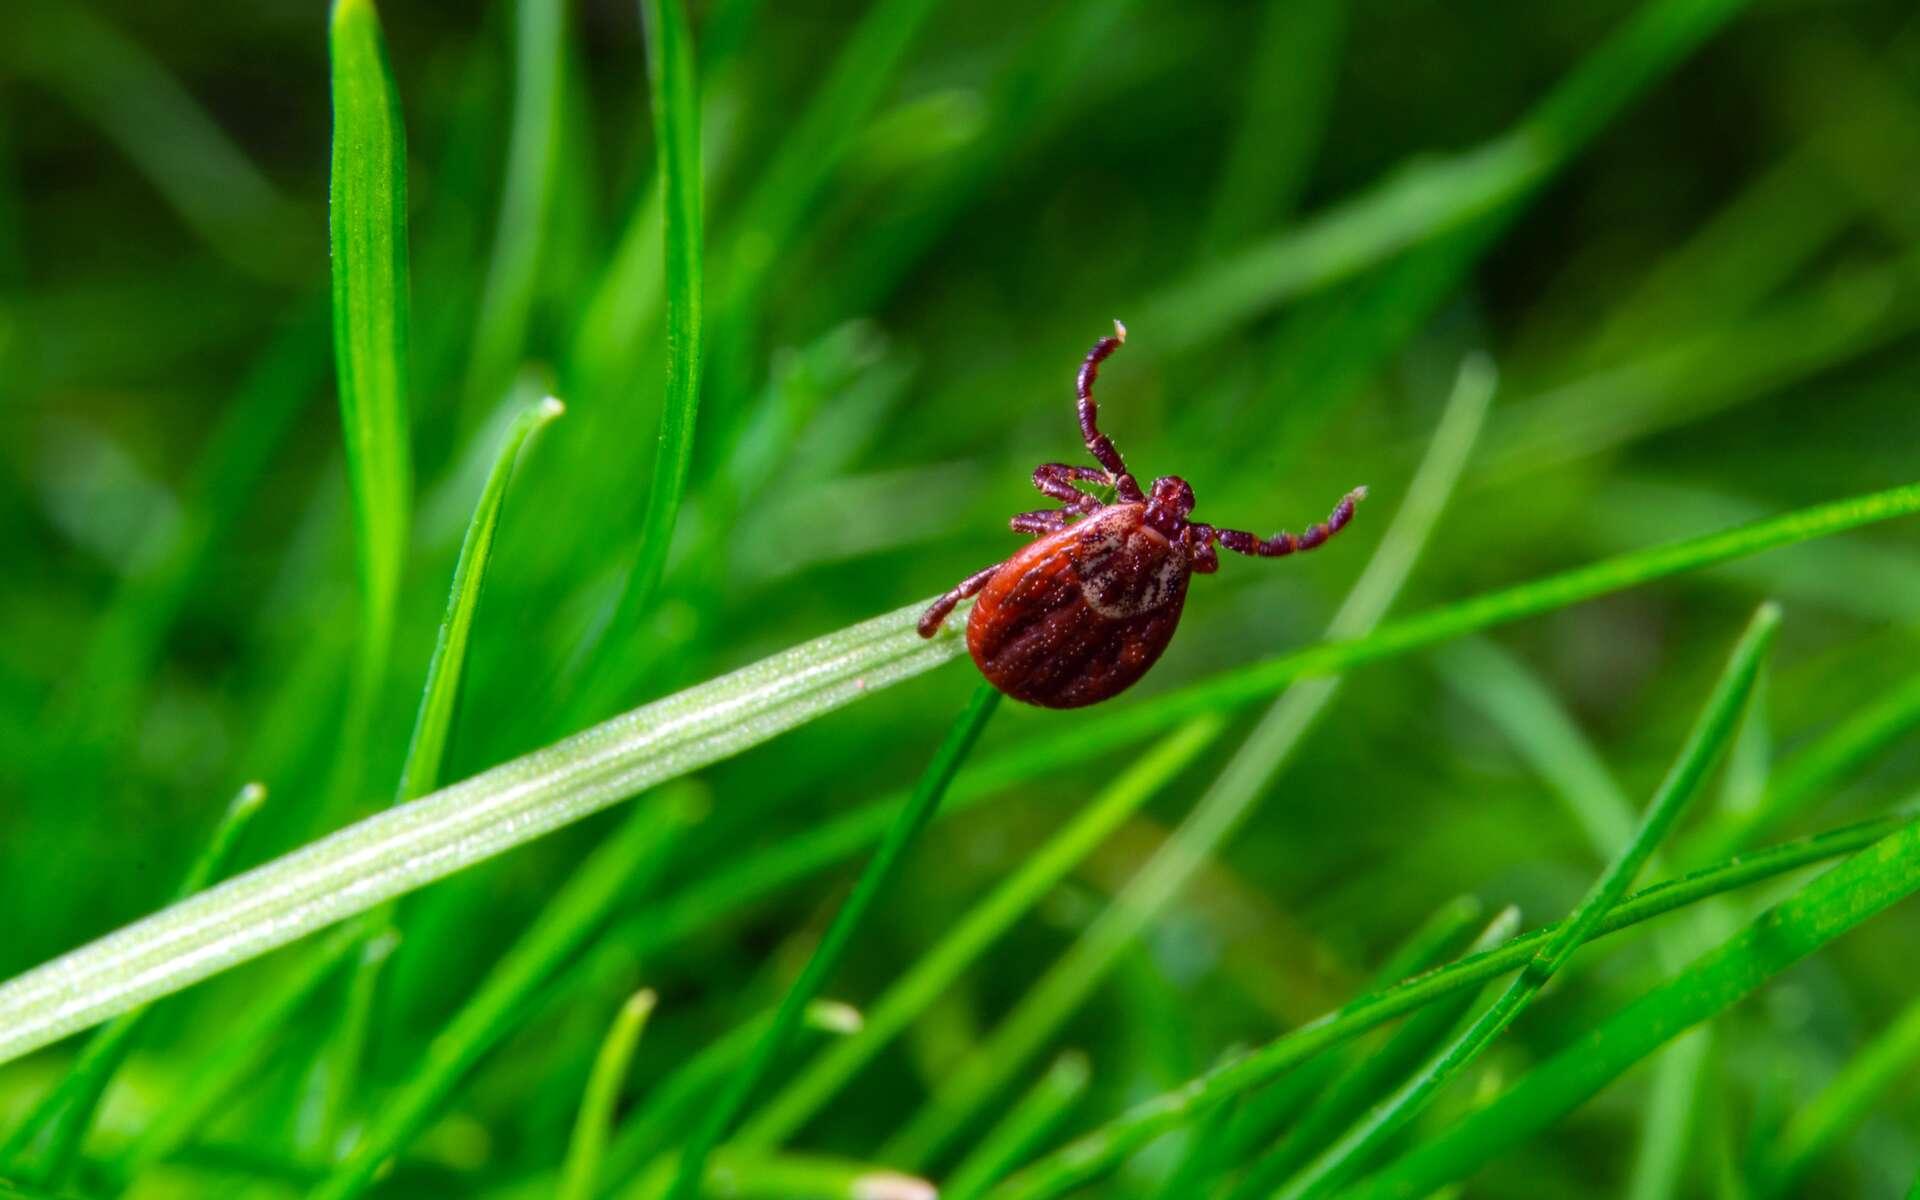 Une tique sur un brin d'herbe. © aleksandr, Adobe Stock